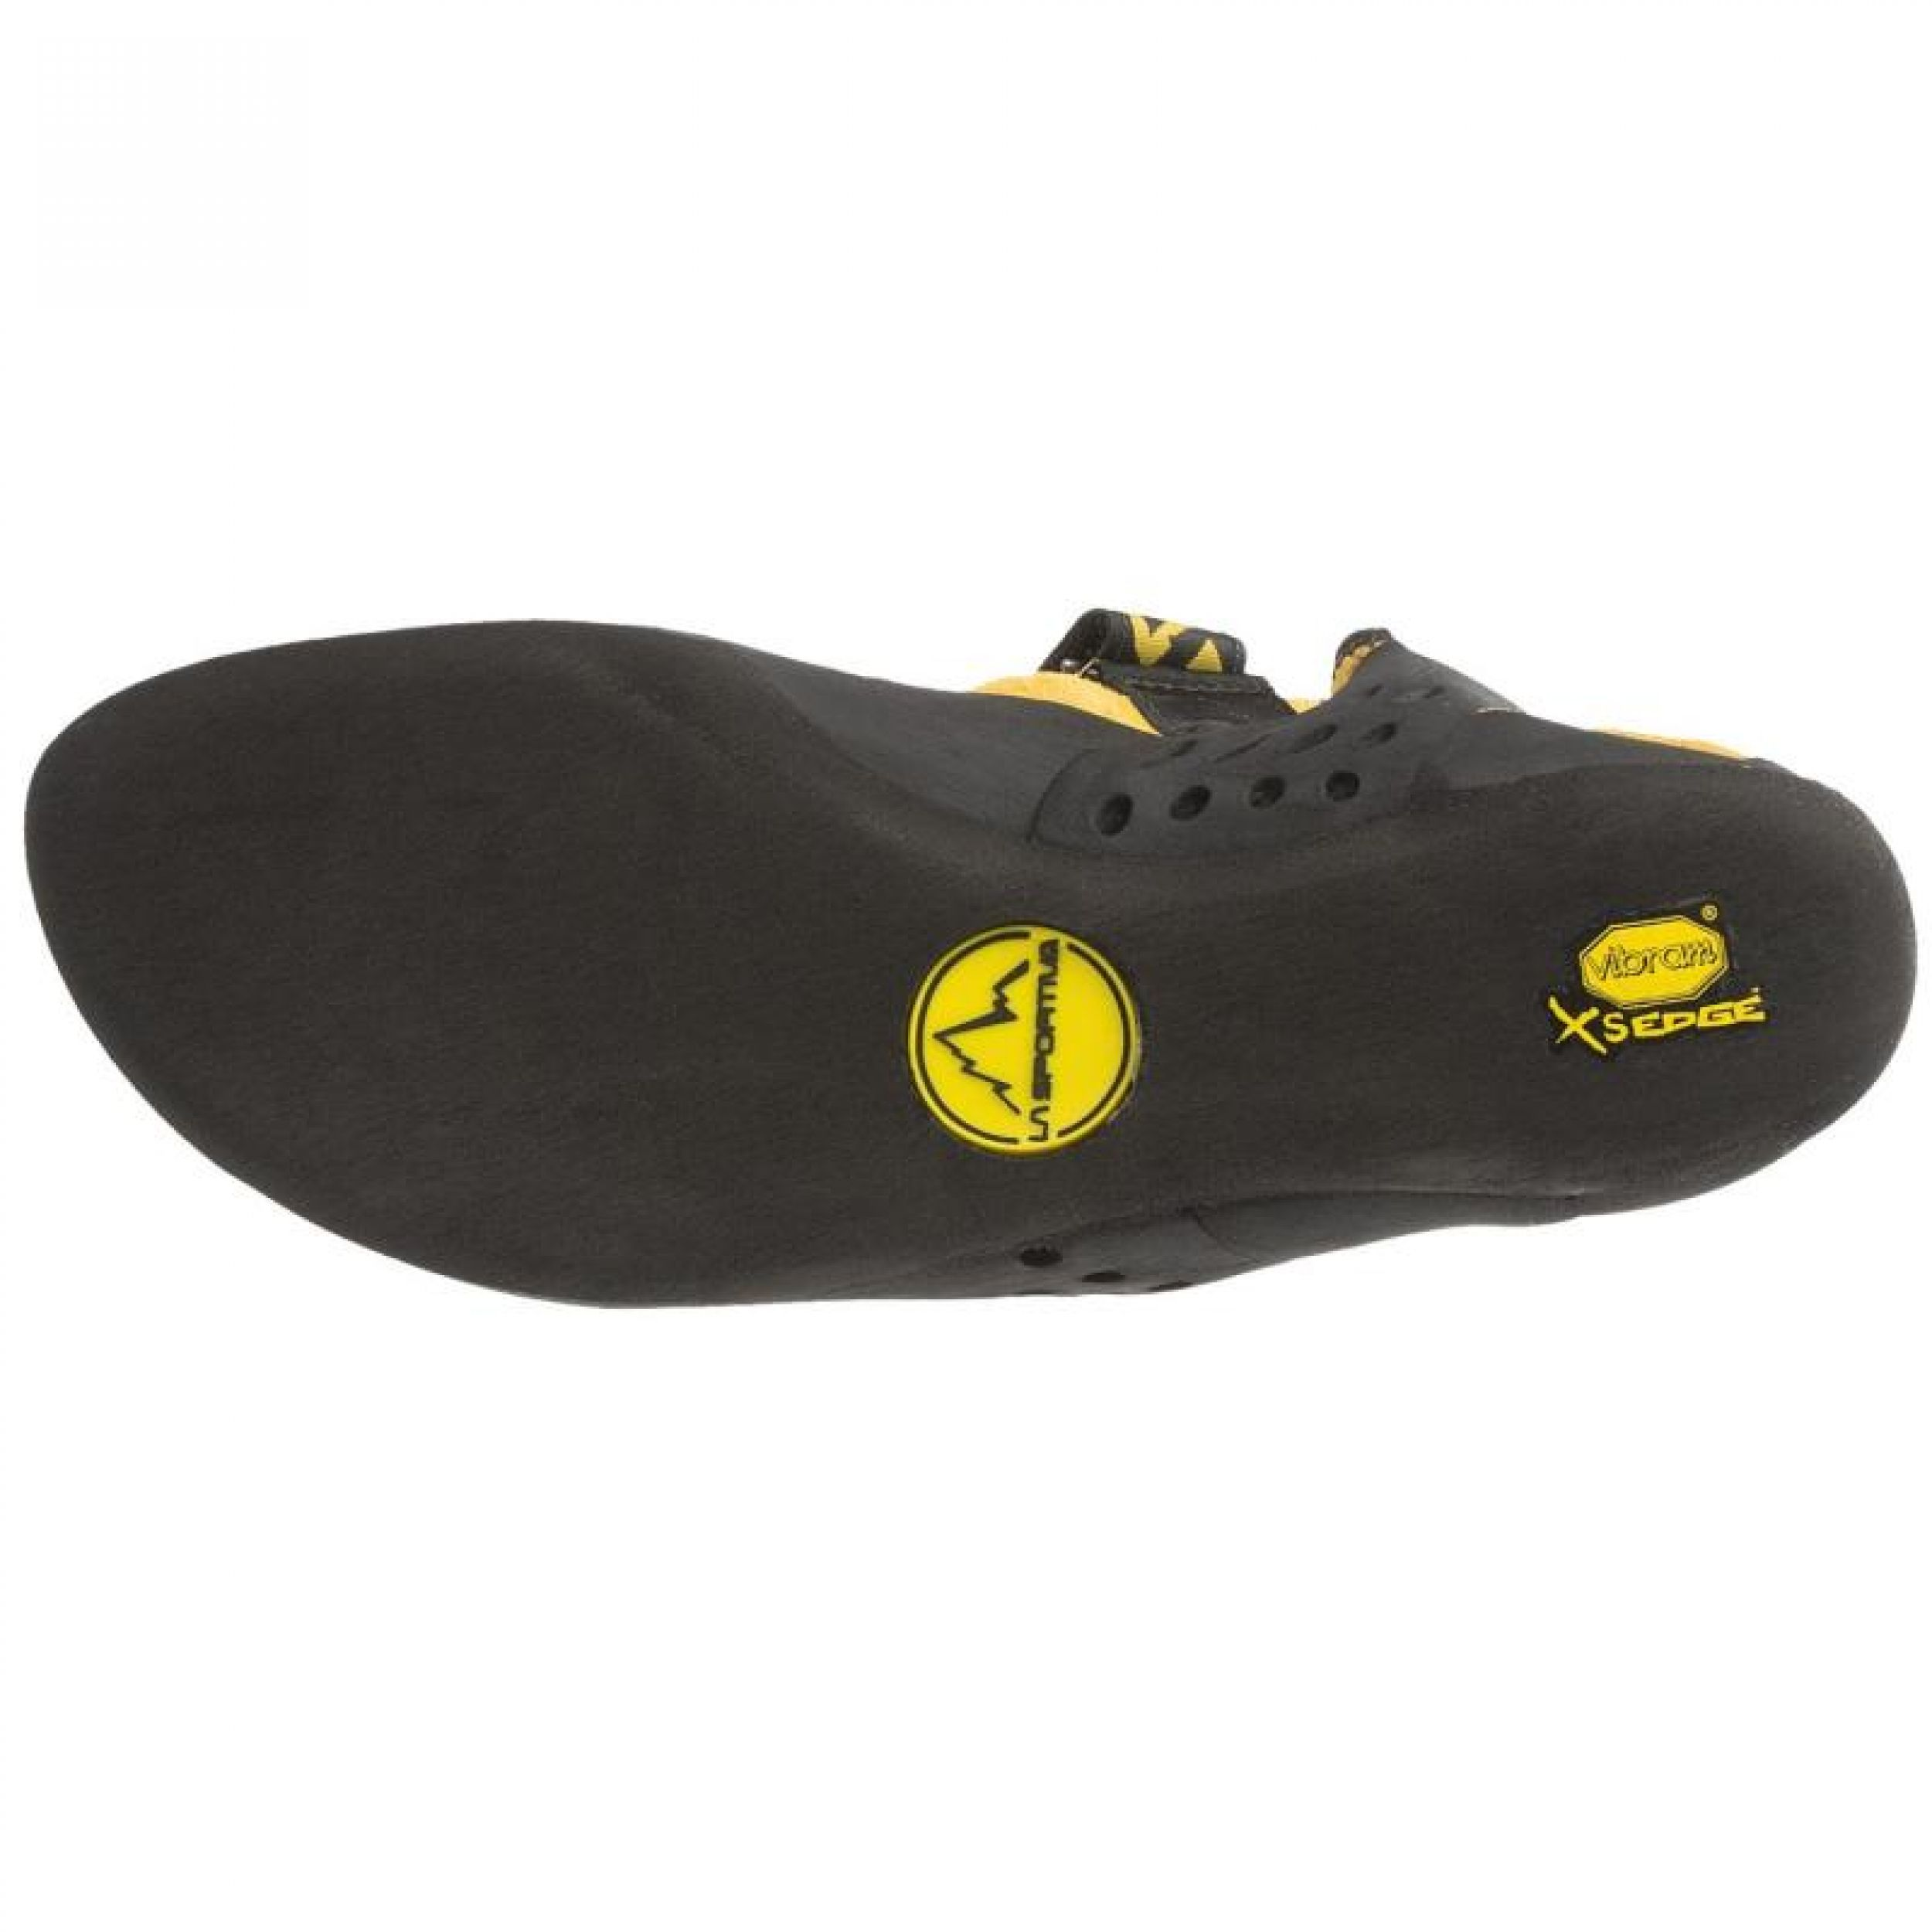 la-sportiva-katana-climbing-shoes-for-men-and-women-a-8411m_3-1500.1.jpg